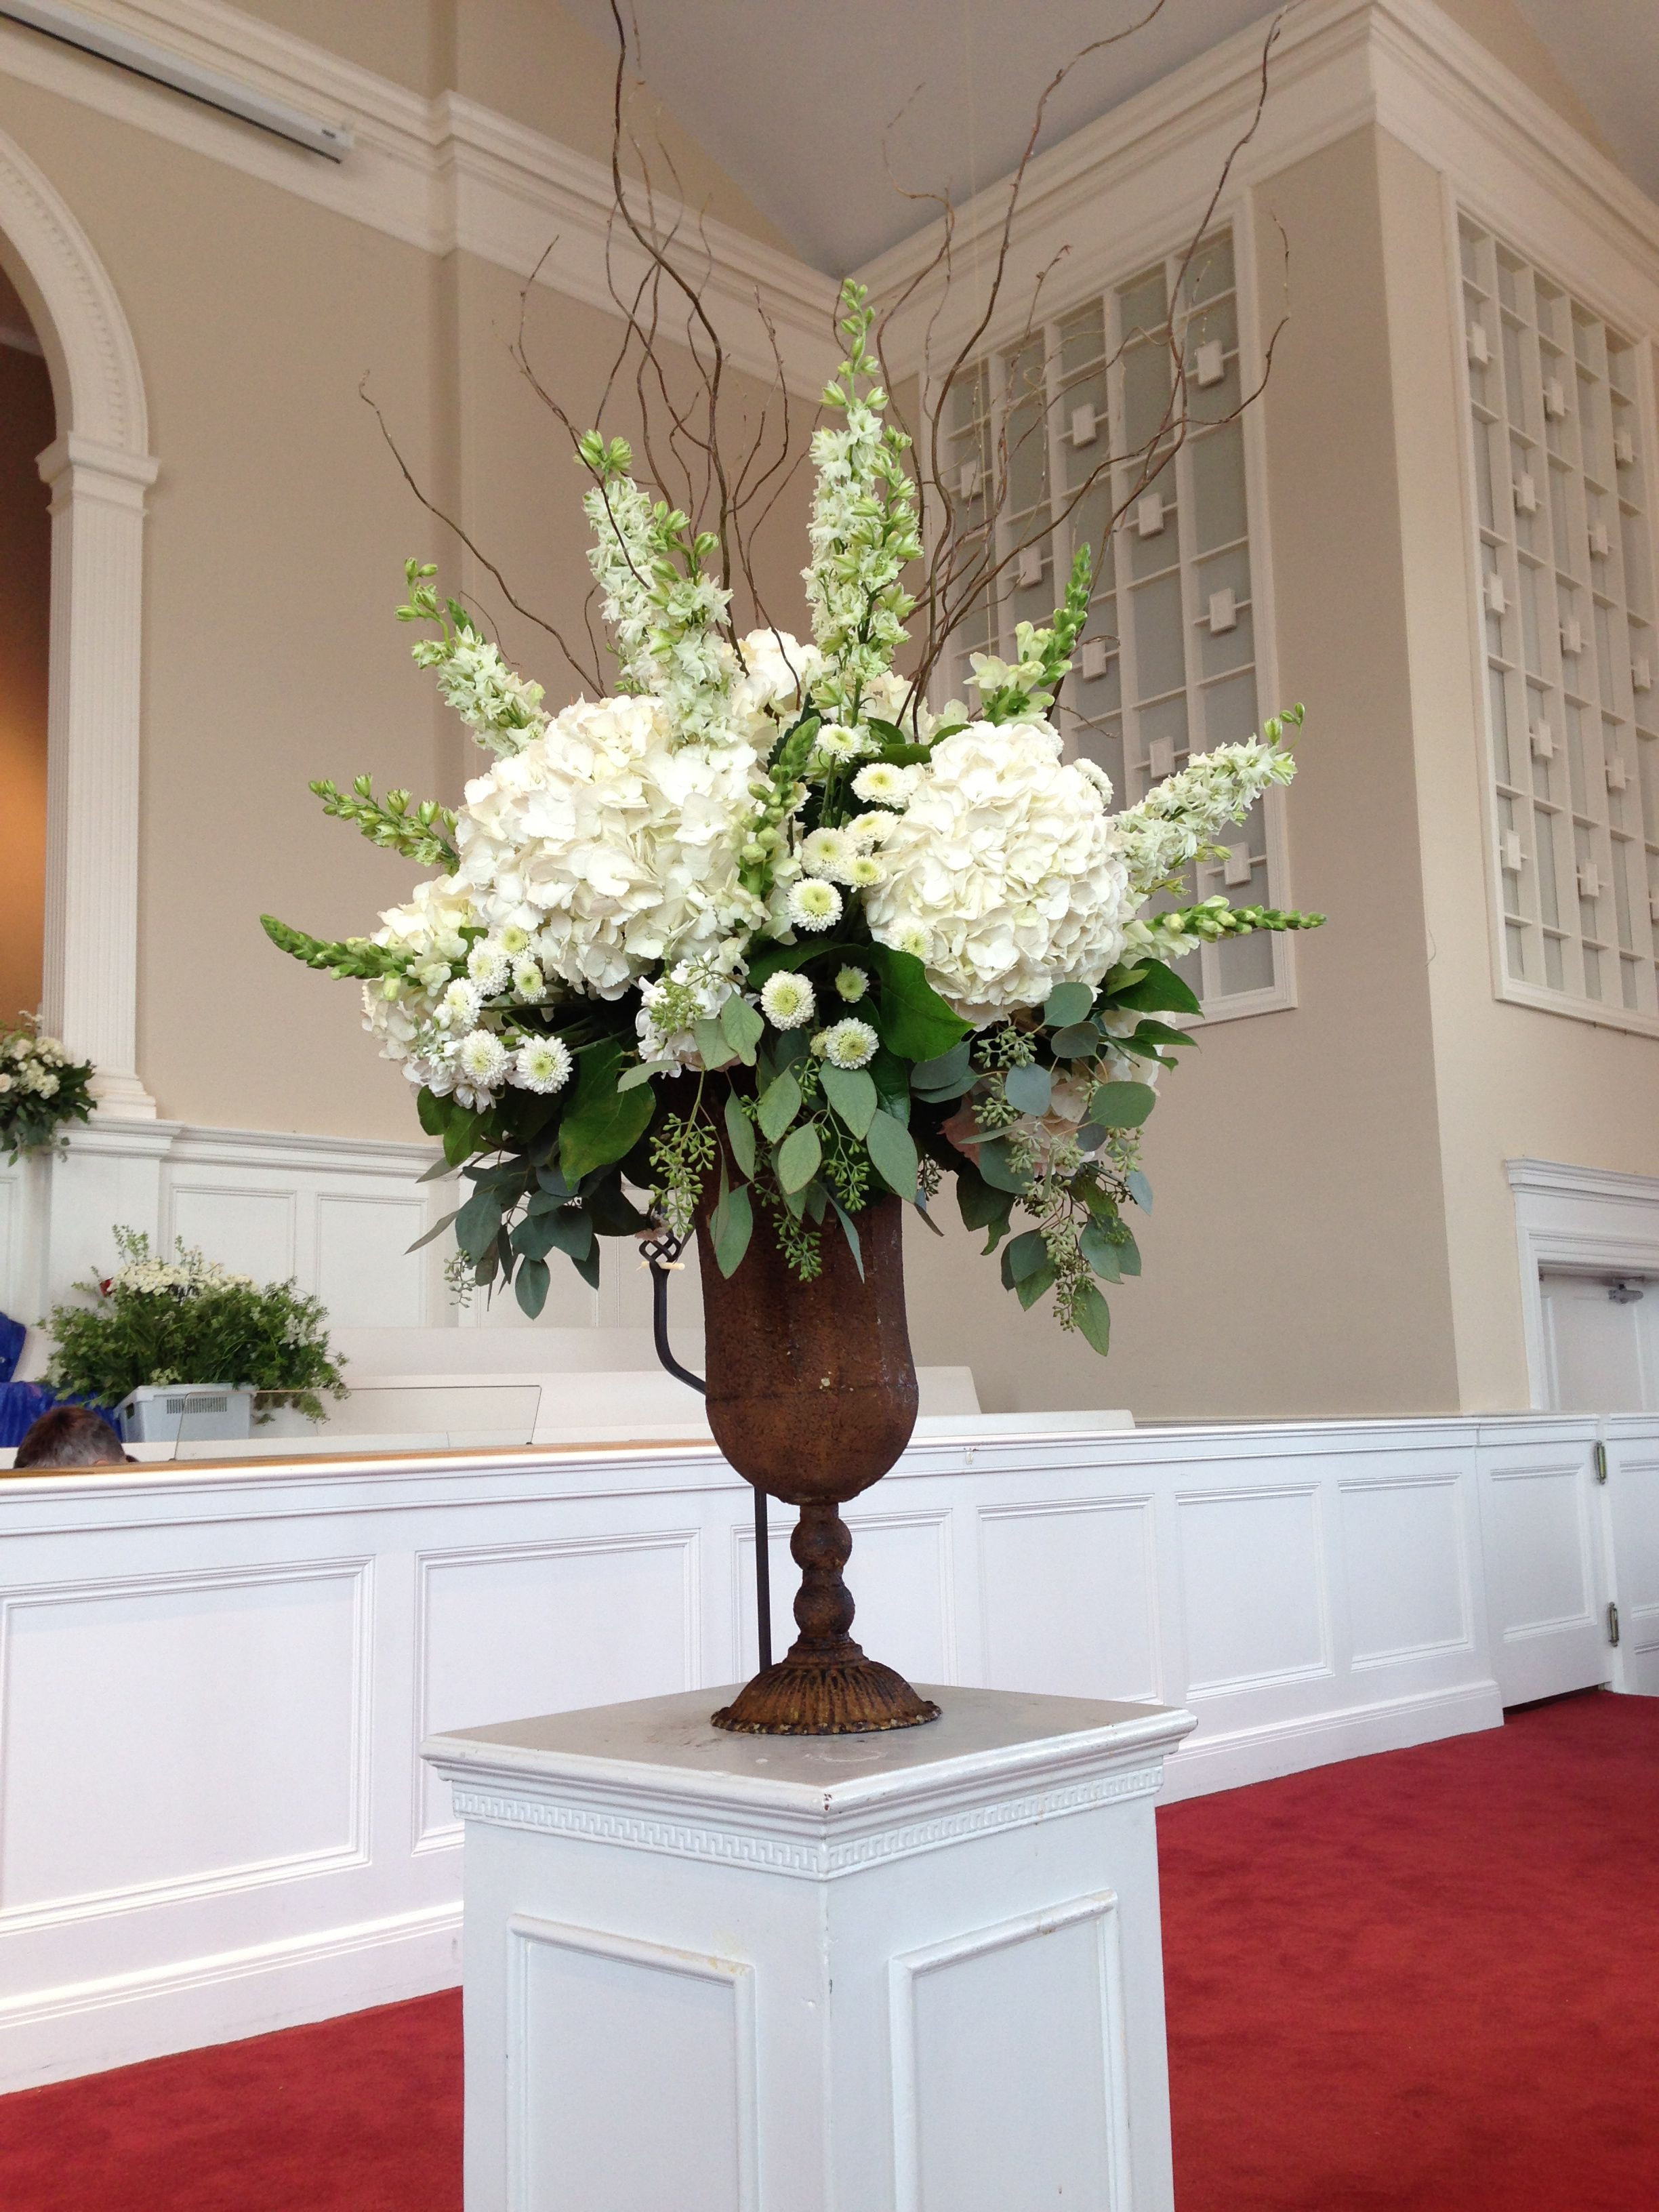 Church Arrangement Florals Wedding Decorations Traditional Wedding Classic Wedding flowers Rustic Urn chic Hydrangeas White Flowers Green